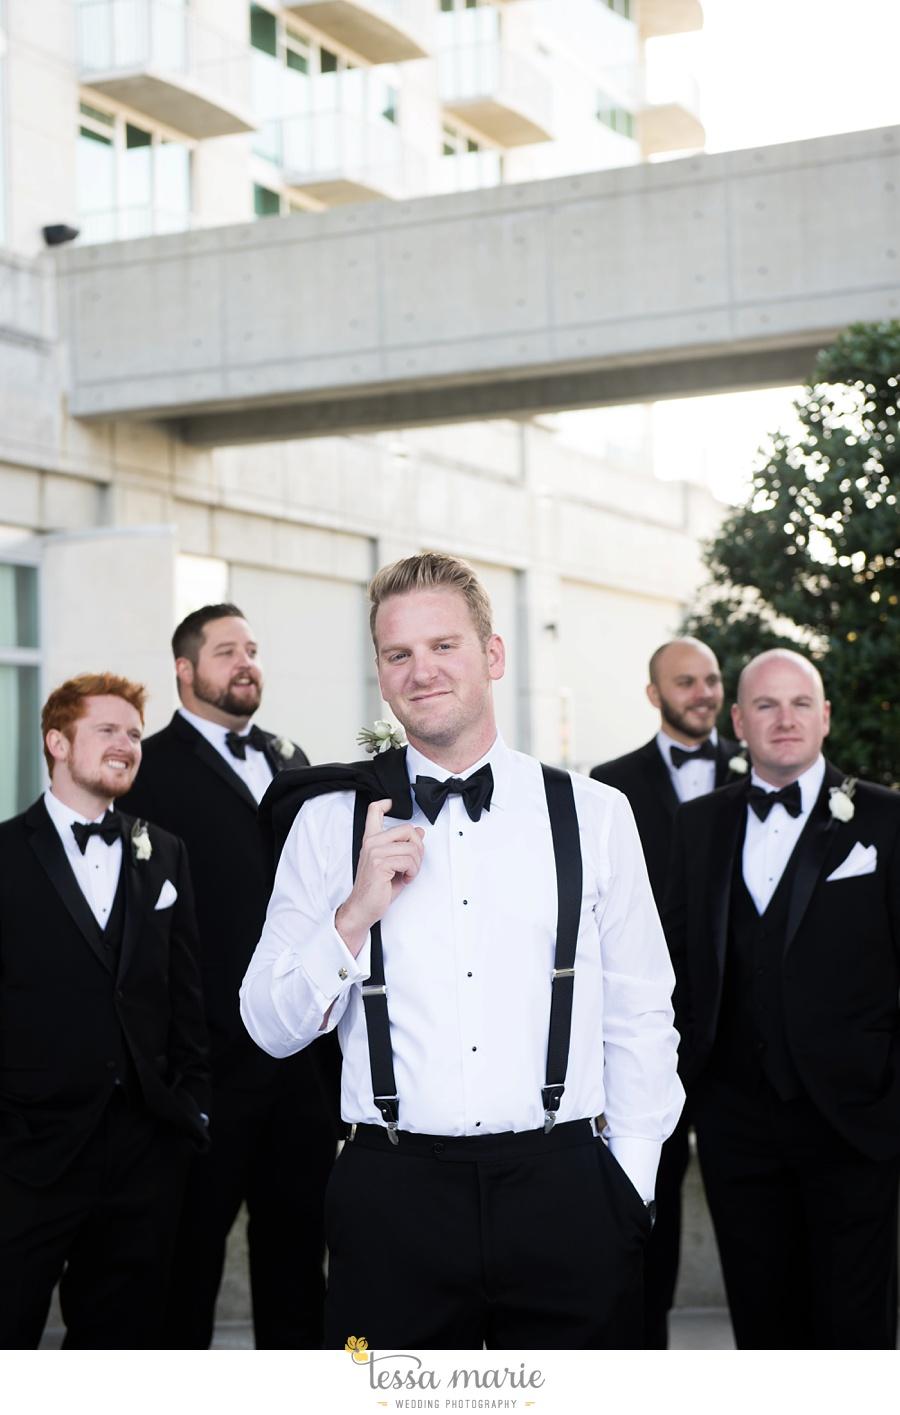 113_tessa_marie_weddings_emotional_moments_photography_king_low_wedding_sam_neil_best_atlanta_wedding_photographer